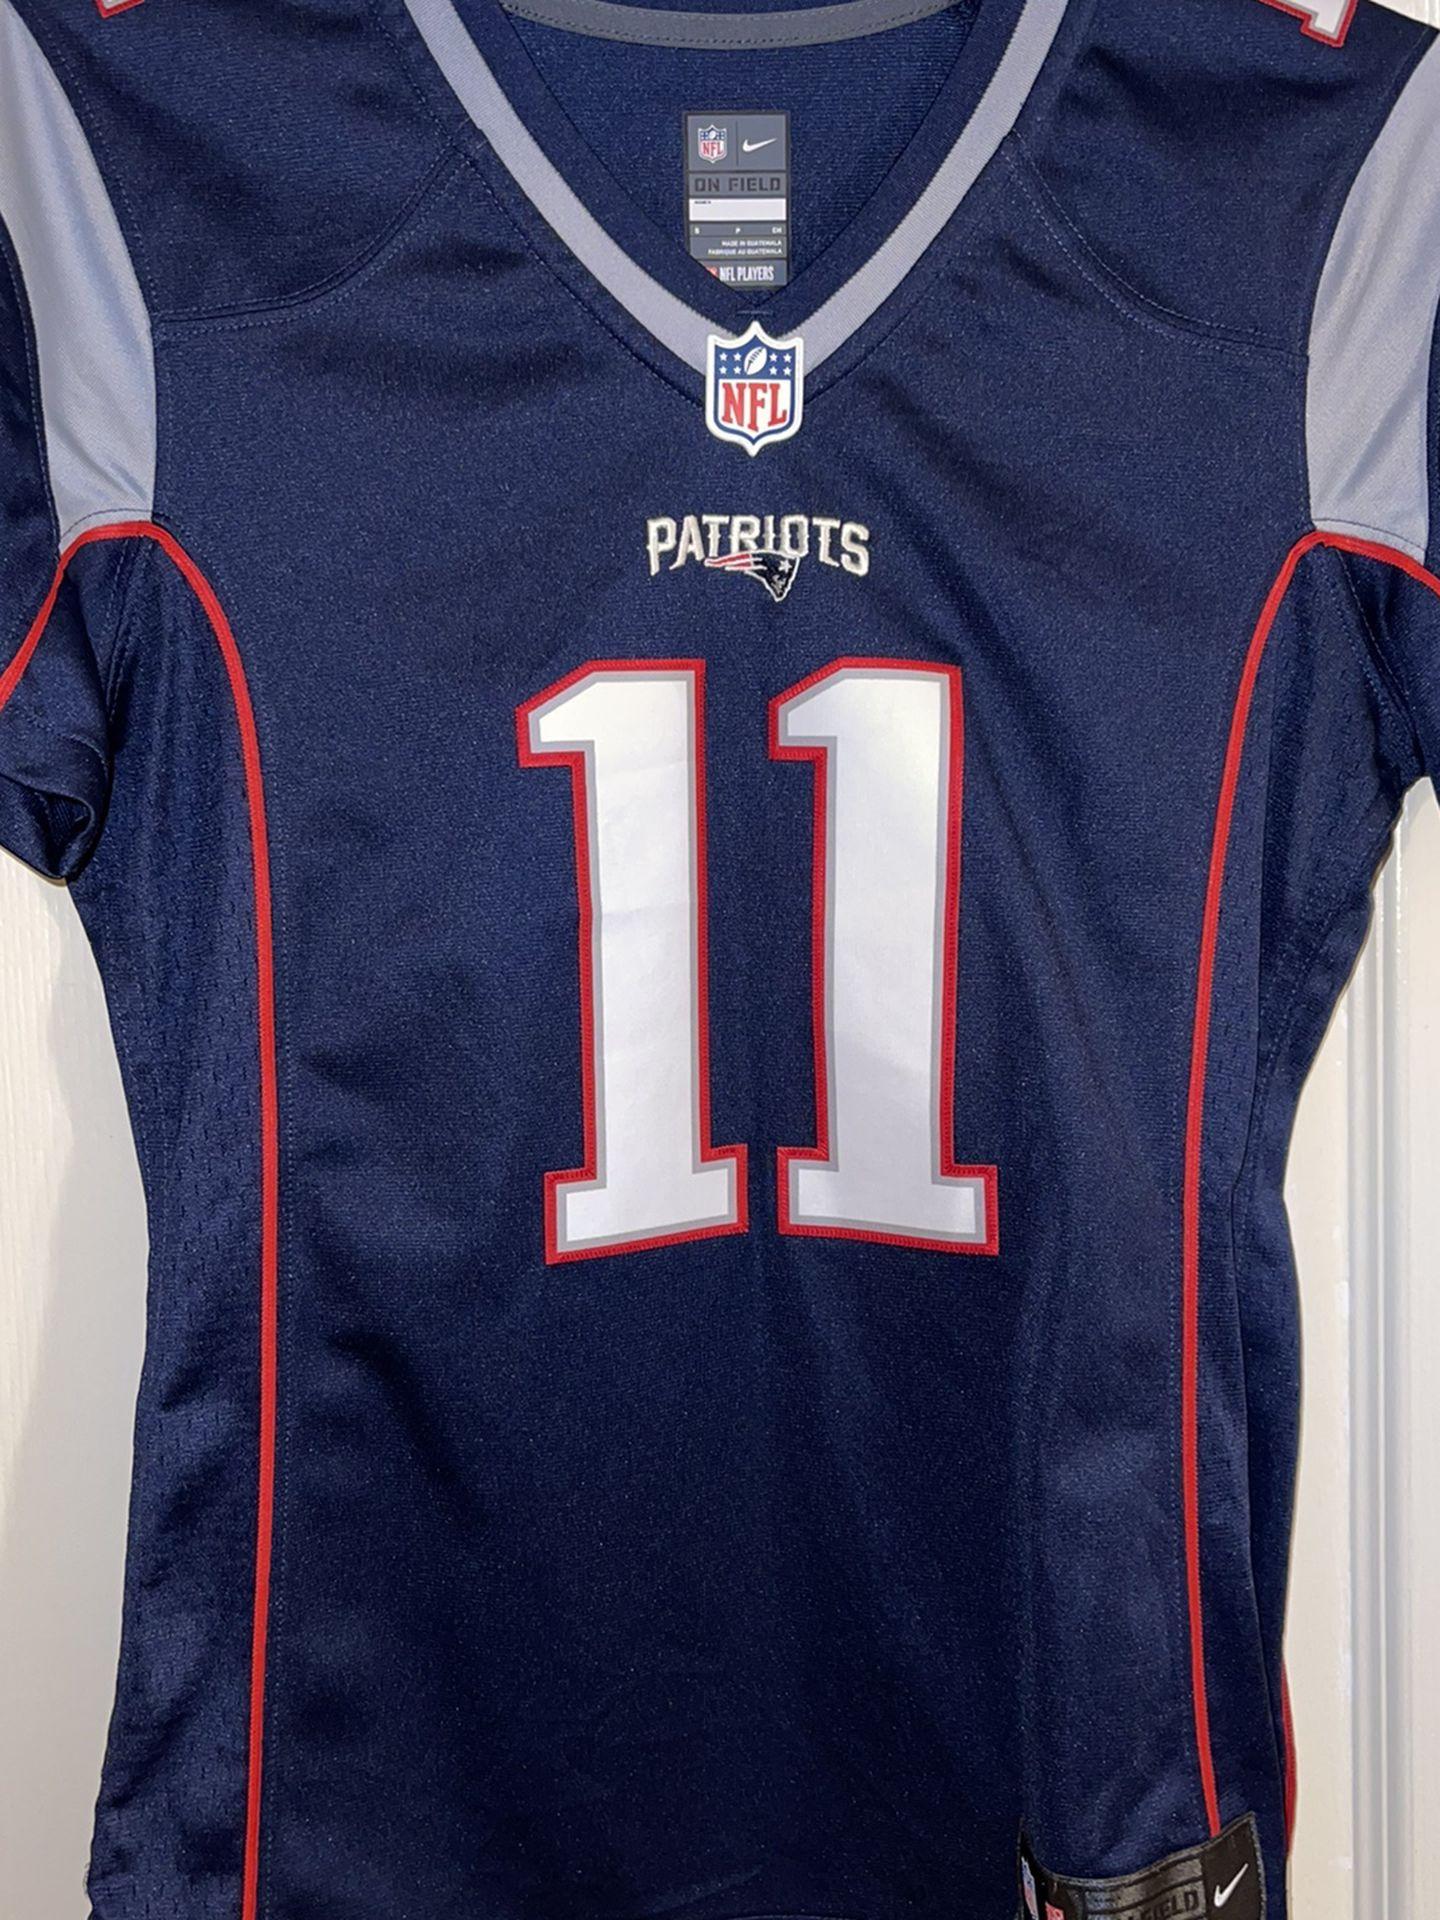 Authentic Women's Patriots Jersey